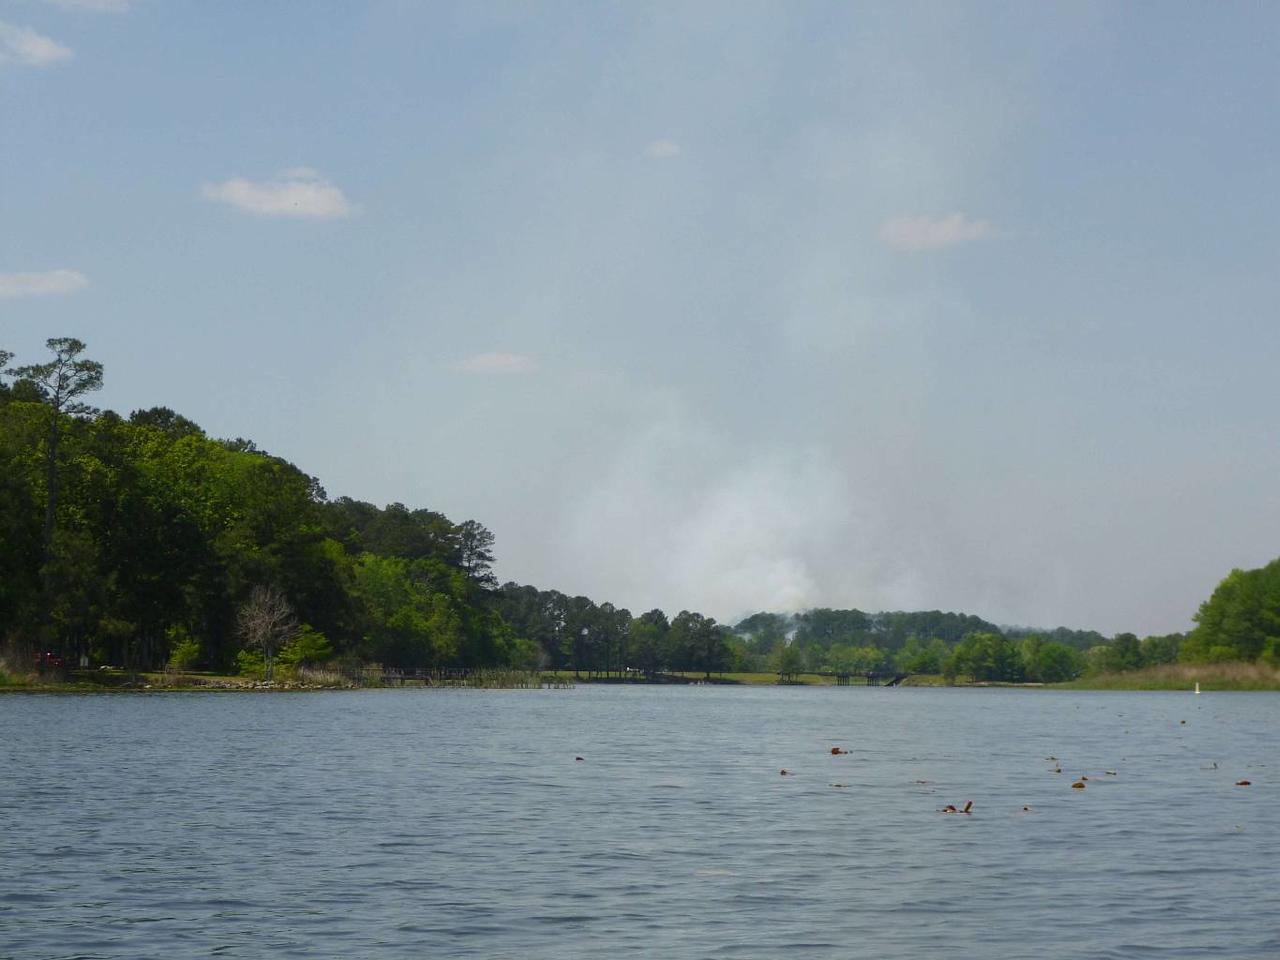 day 3 10 fire near CG P1020769-a-C